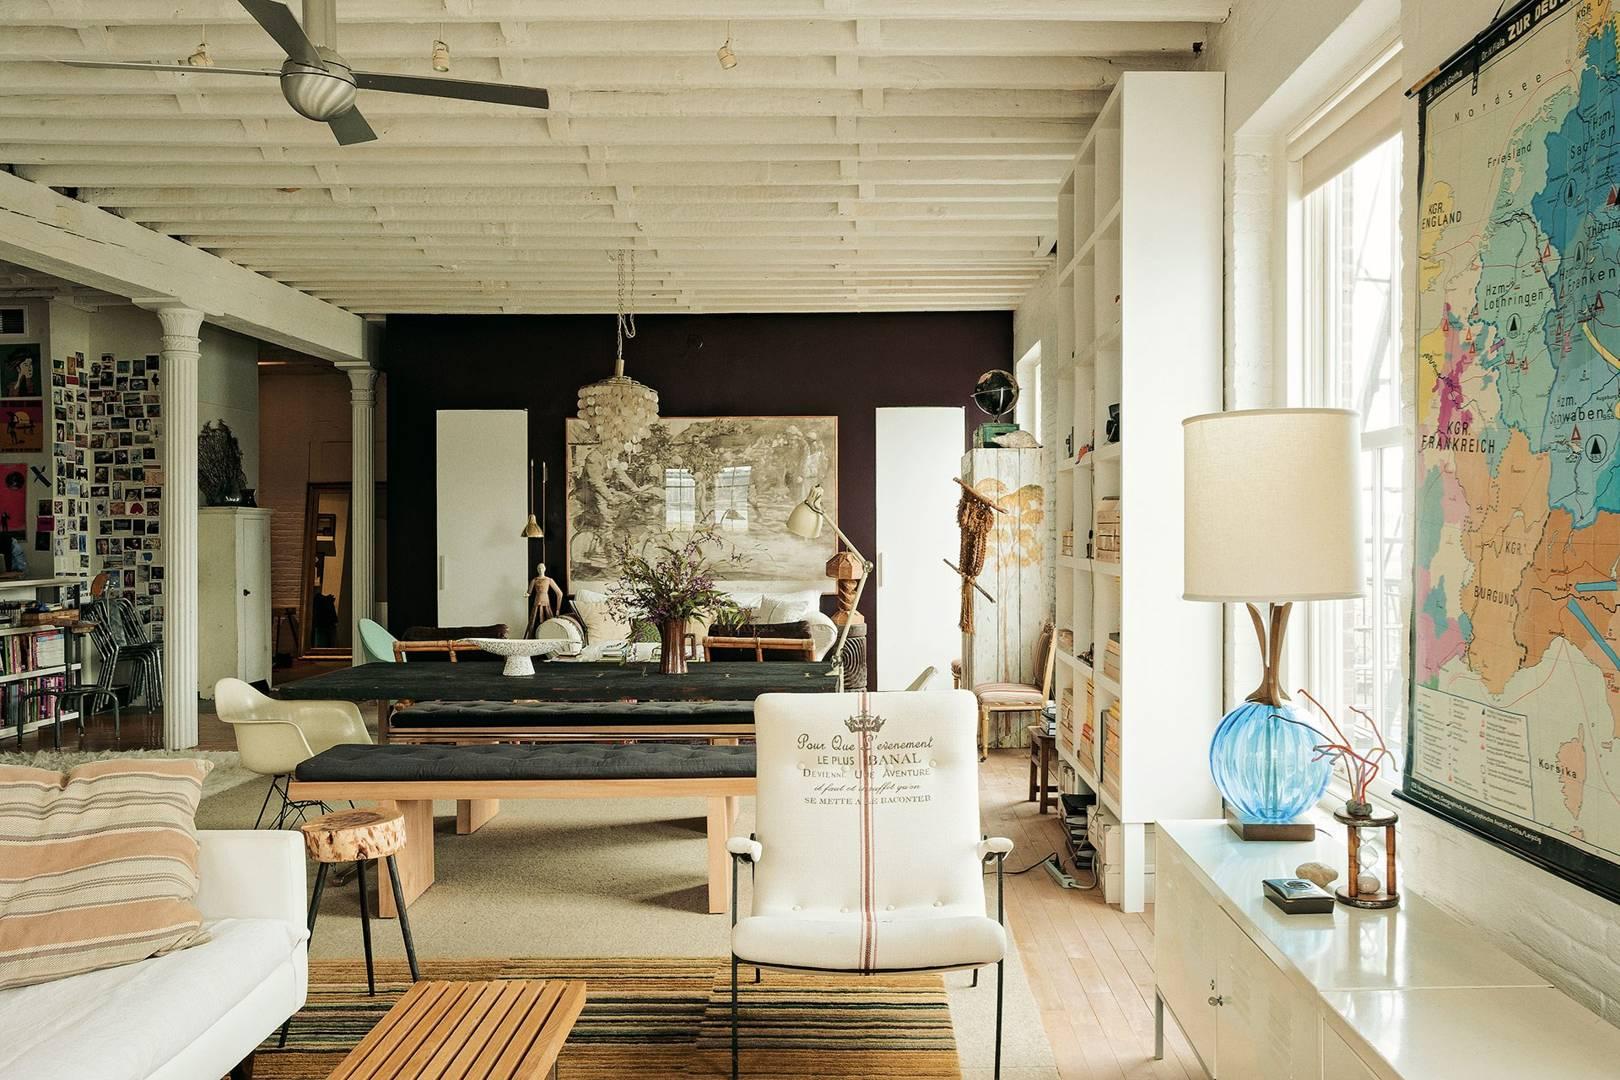 & Brooklyn Interiors - Homes Brooklyn New York | House u0026 Garden